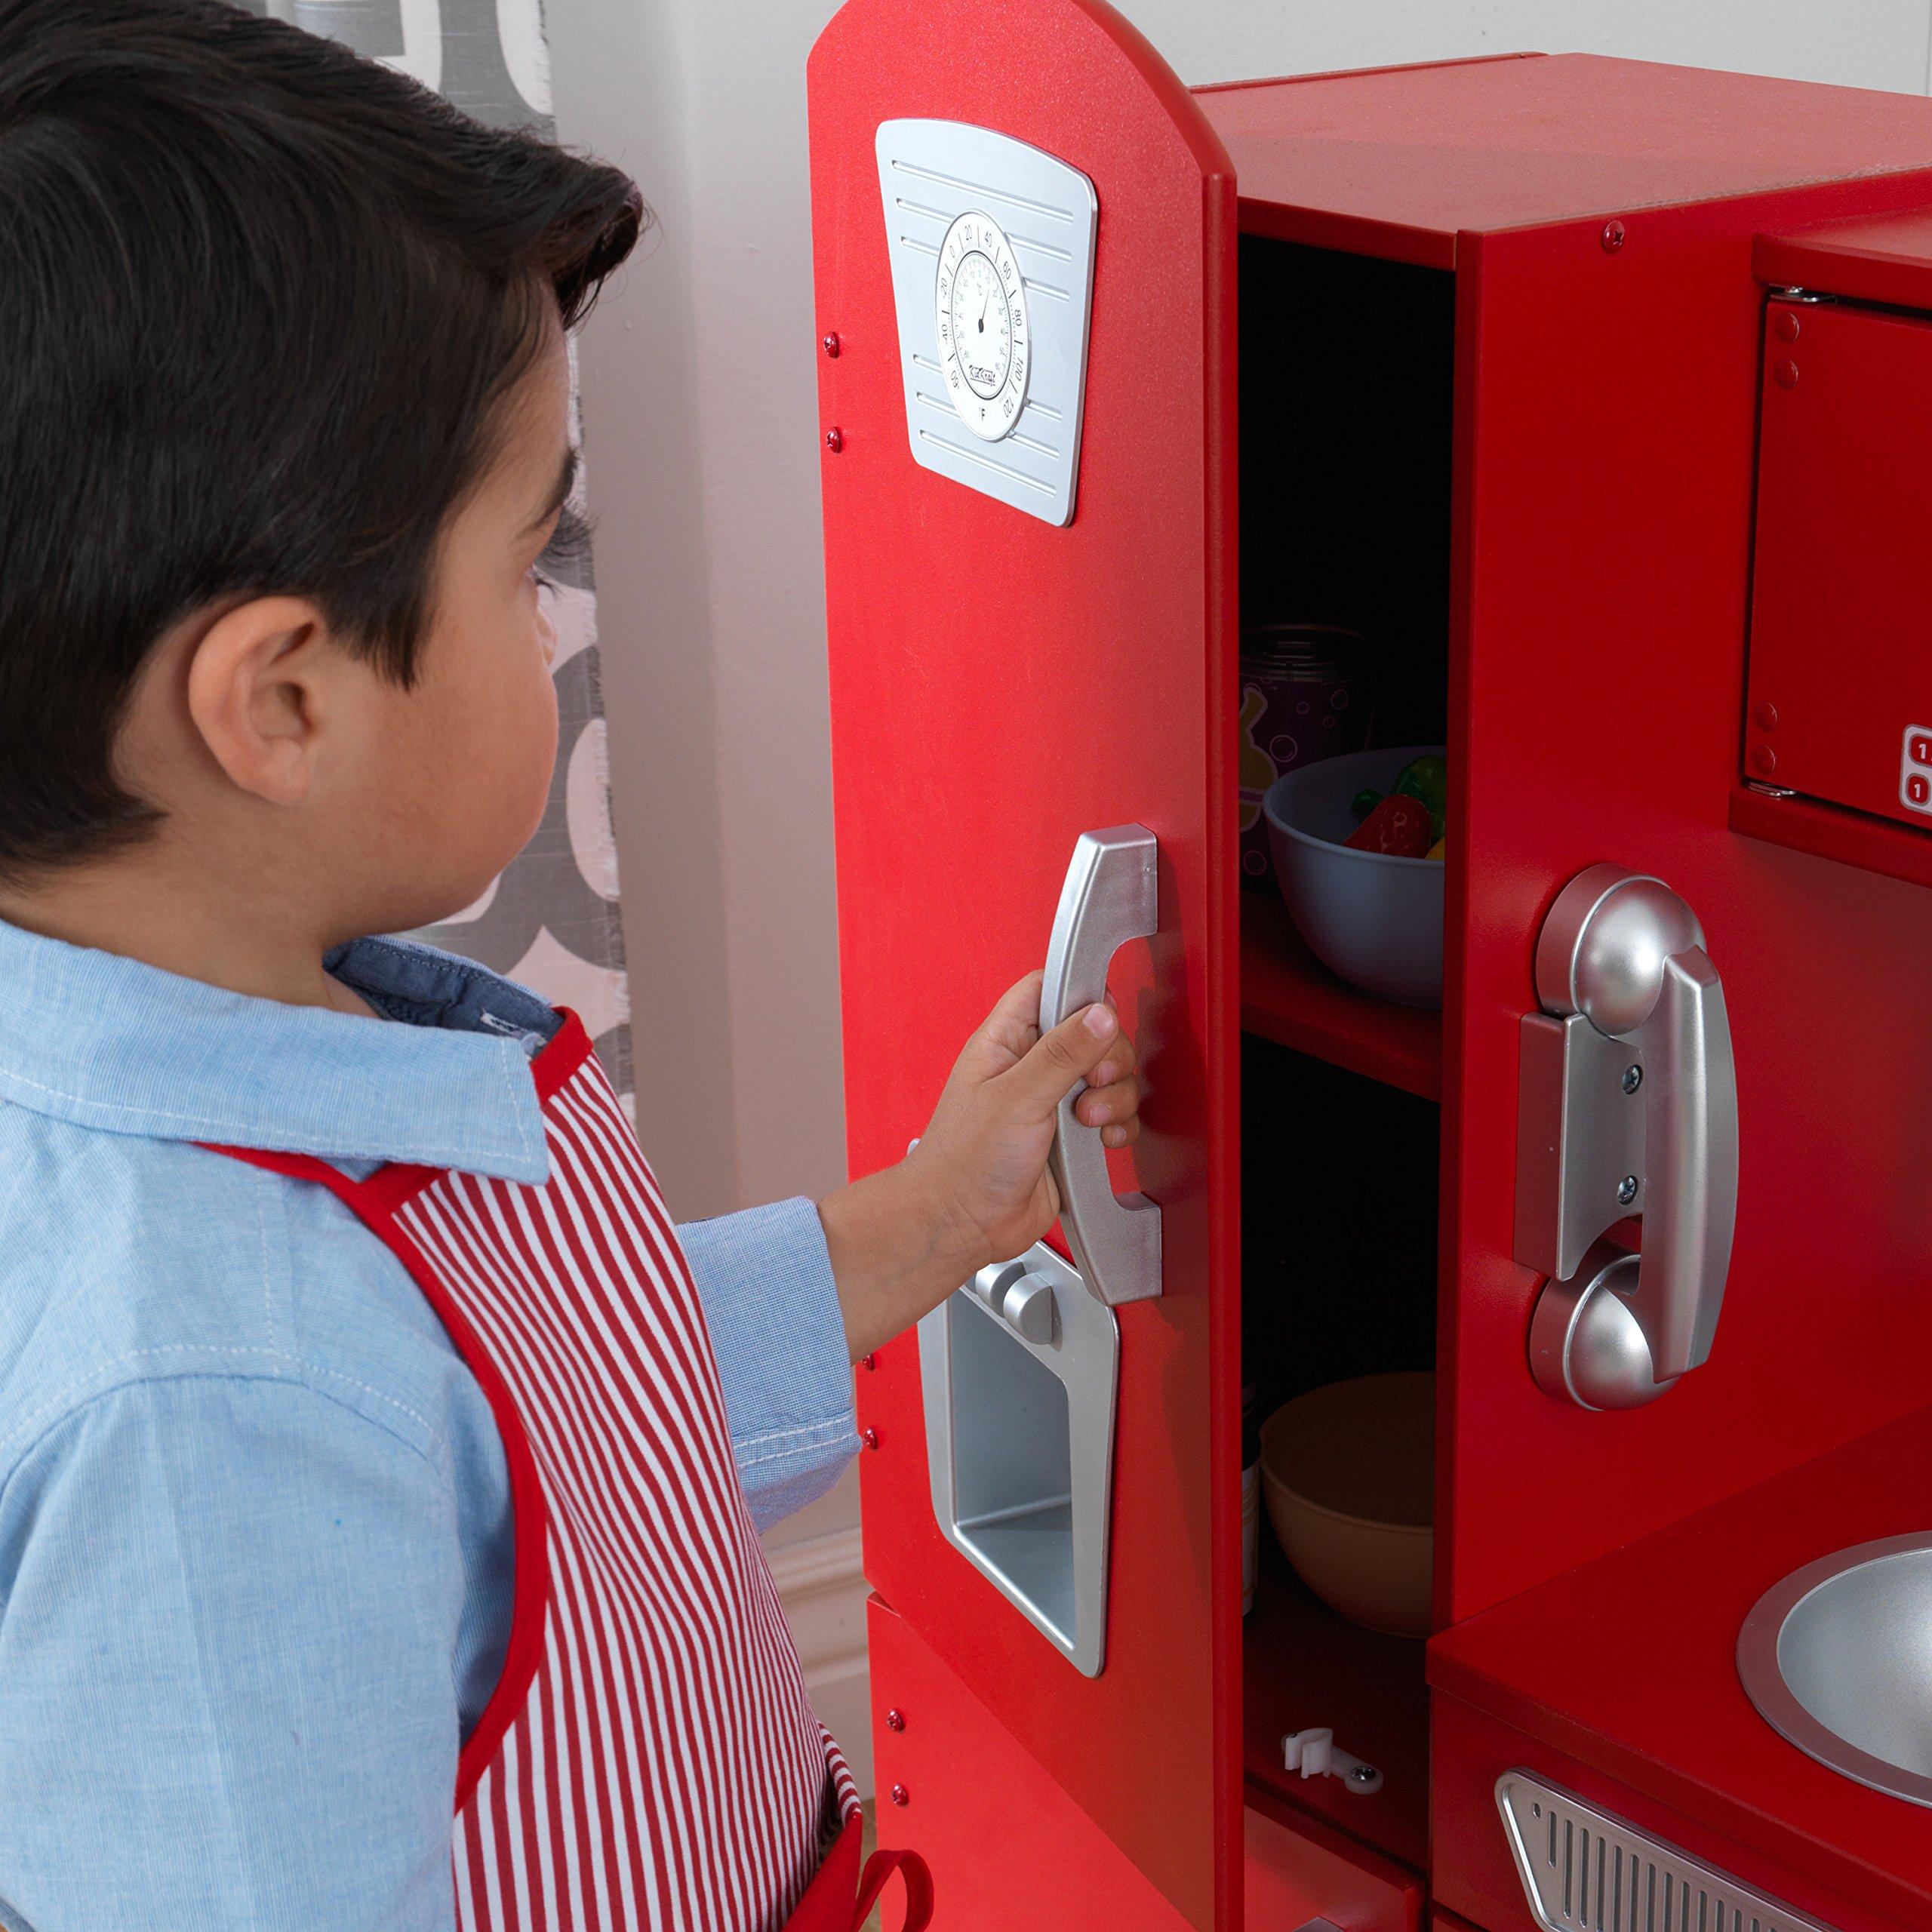 KidKraft Vintage Play Kitchen - Red by KidKraft (Image #13)